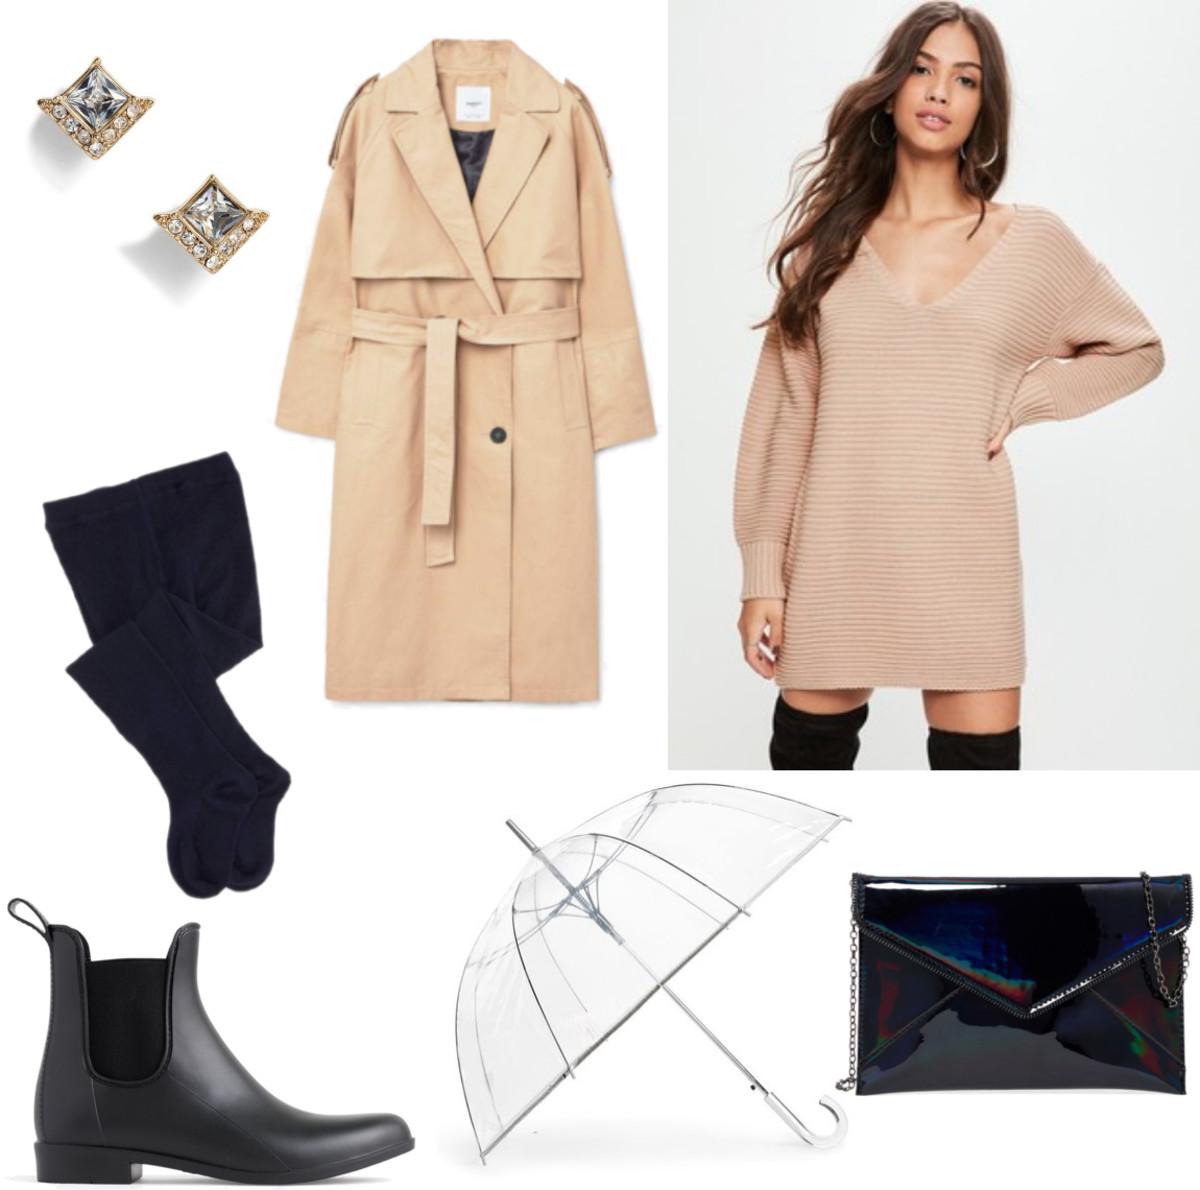 tan-dress-sweater-black-tights-studs-blue-bag-black-shoe-booties-tan-jacket-coat-trench-fall-winter-lunch.jpg